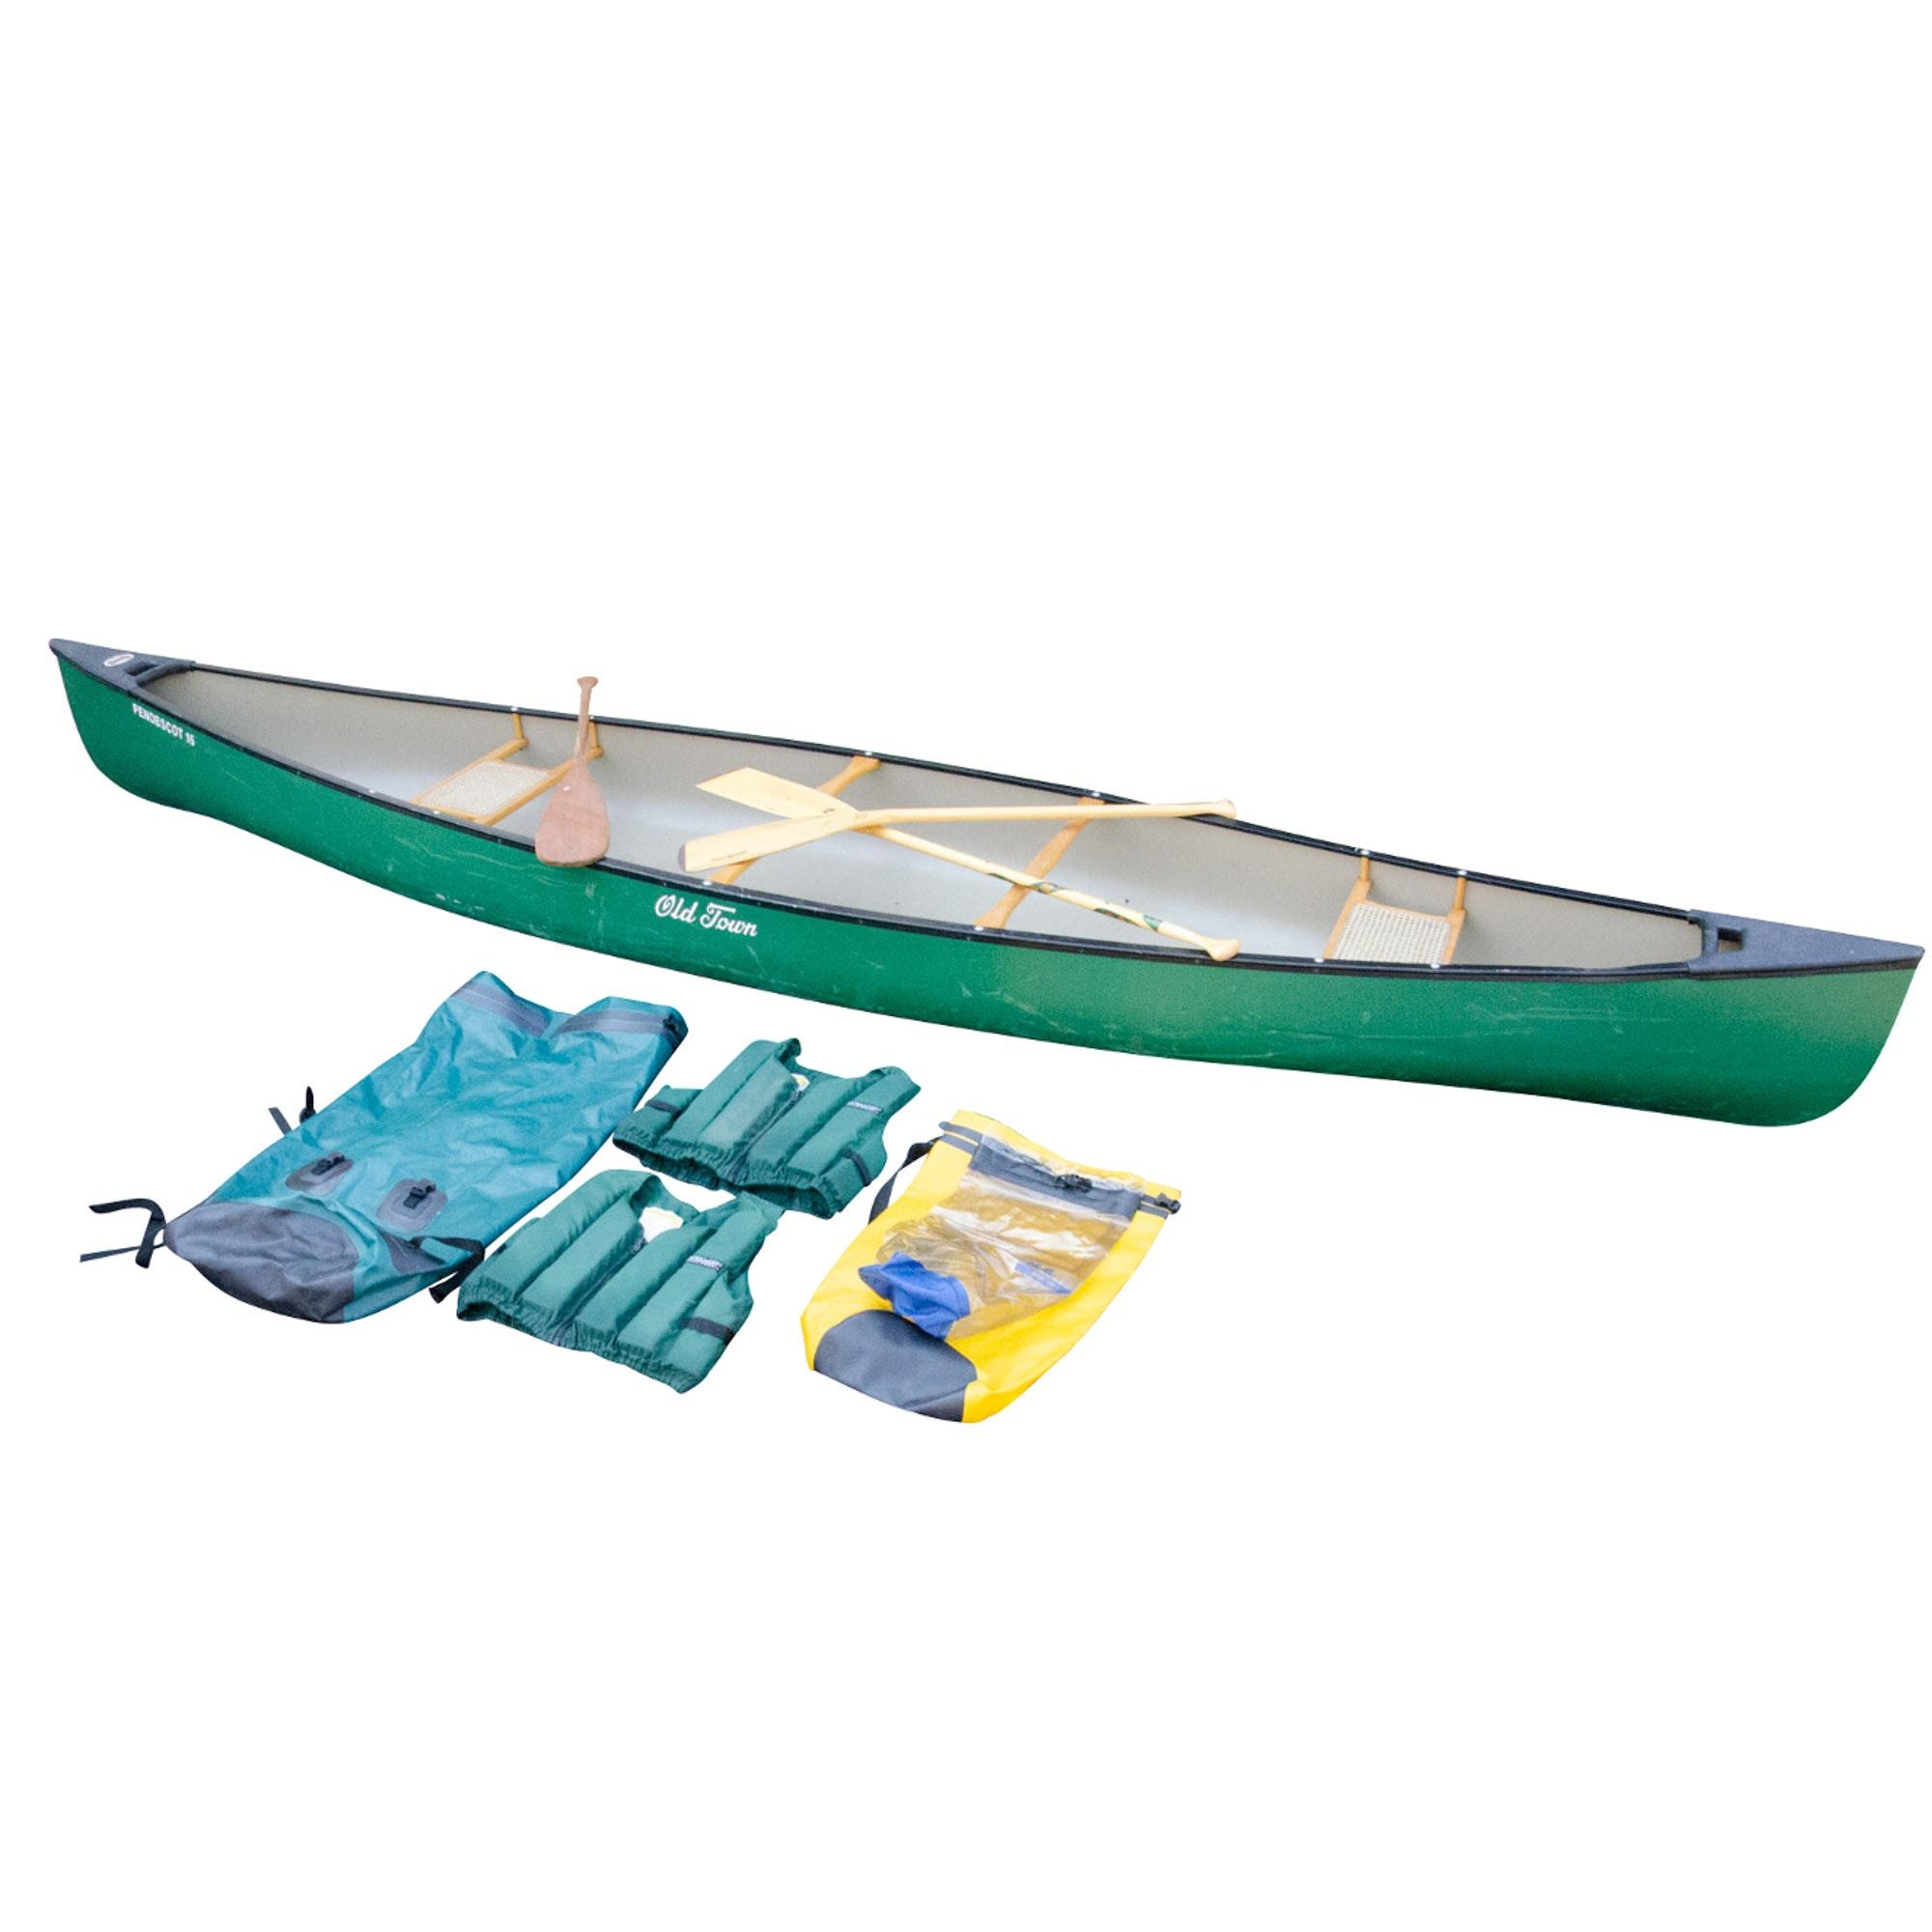 "Old Town ""Penobscot 16"" Lightweight Canoe, Life Preservers and Waterproof Bags"